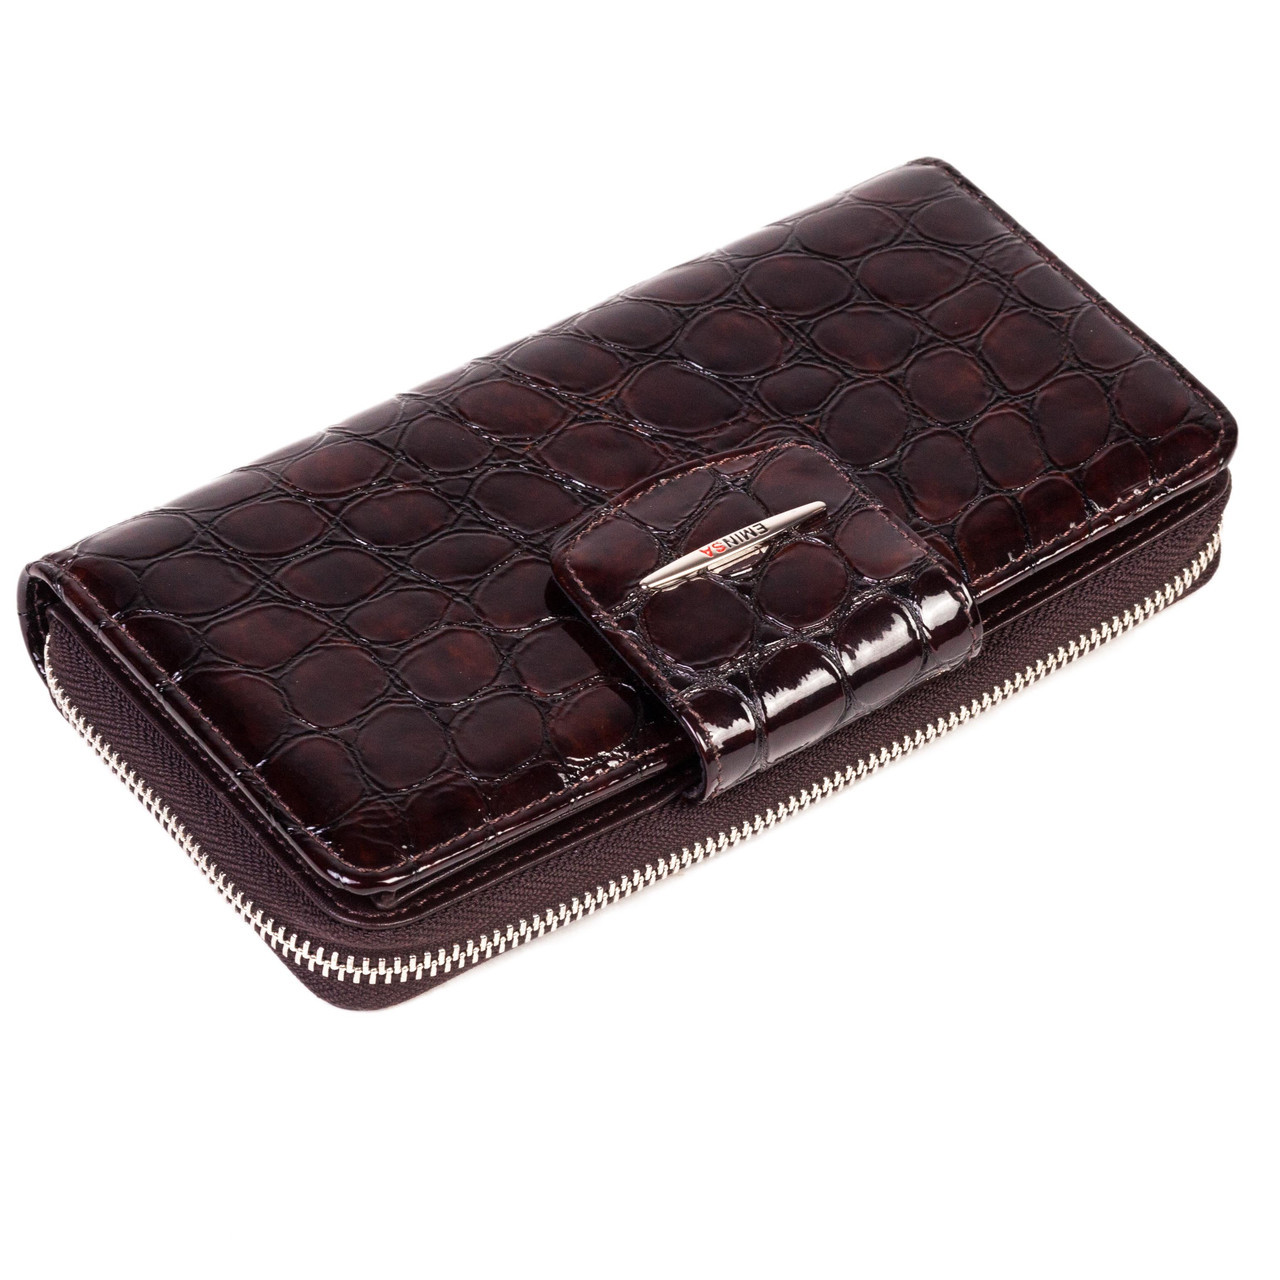 Женский кошелек кожаный коричневый Eminsa 2149-7-3